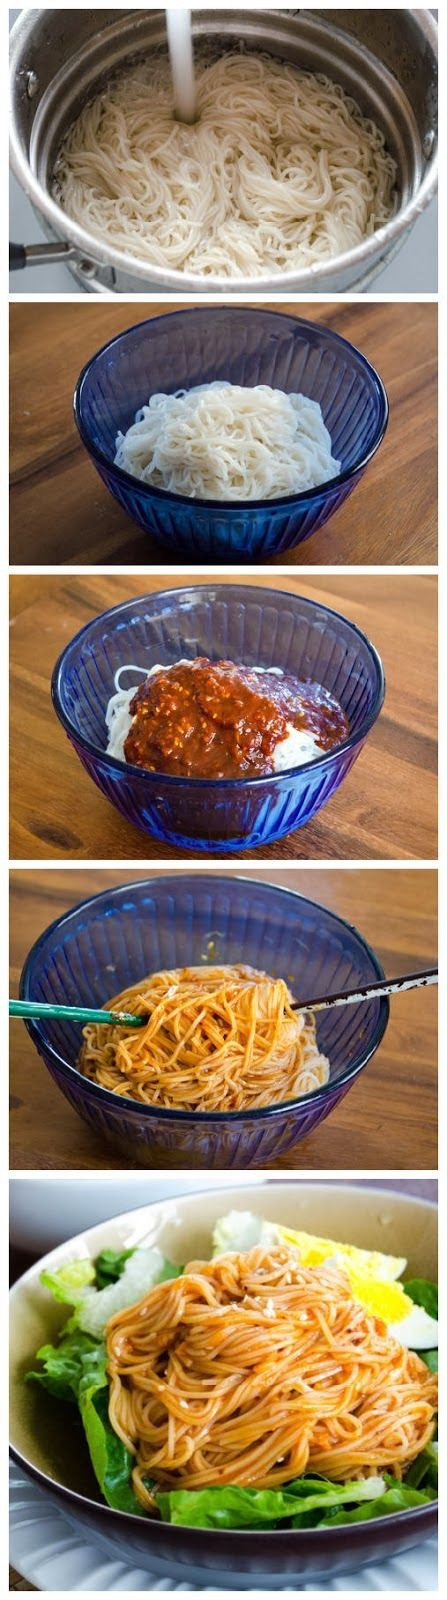 Bibimguksu Noodle Recipe - A delicious Korean noodle recipe - International Recipes